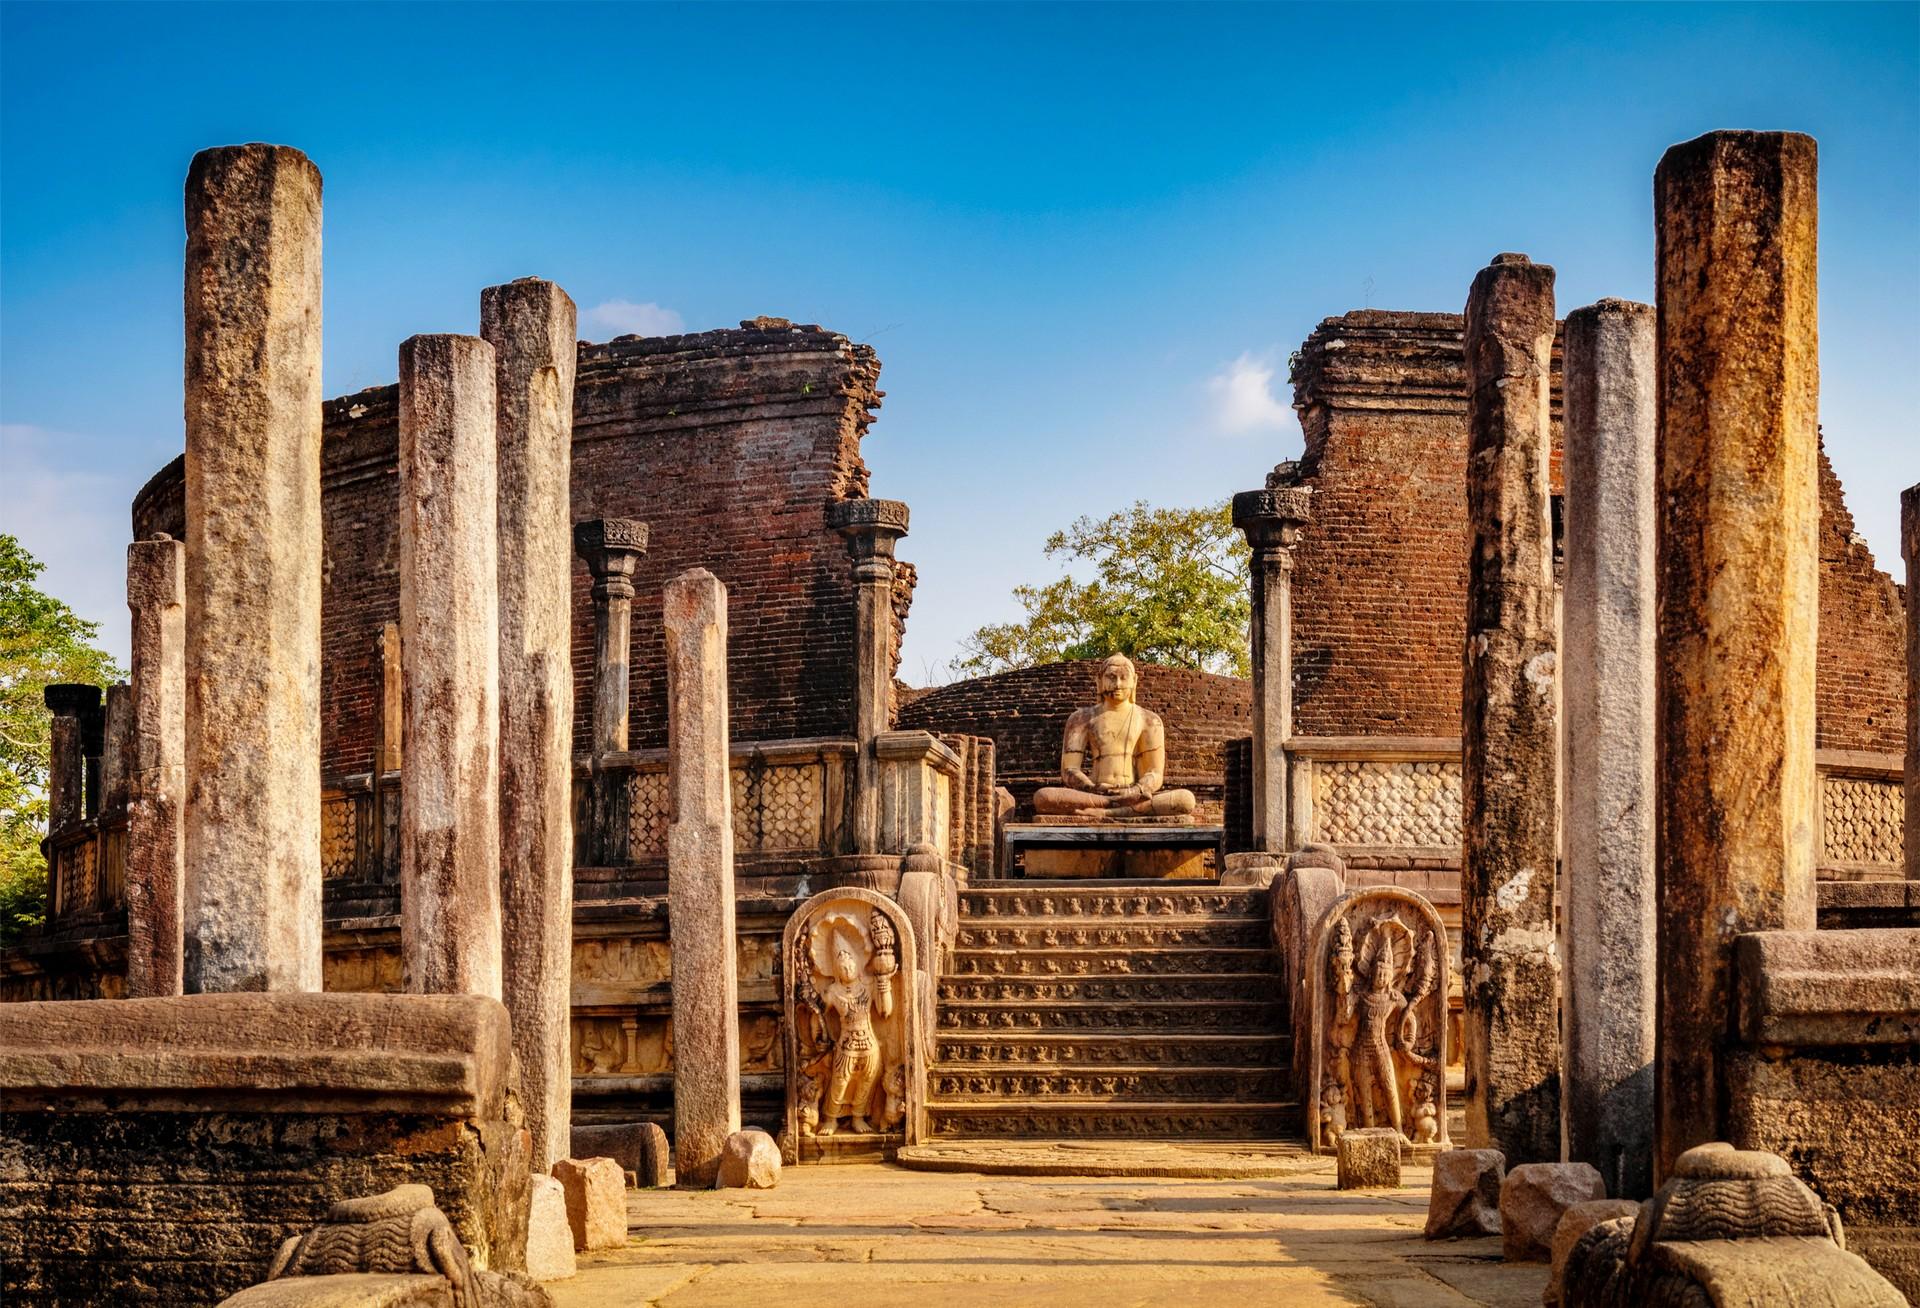 Sri Lanka holidays: Polonnaruwa UNESCO ruins